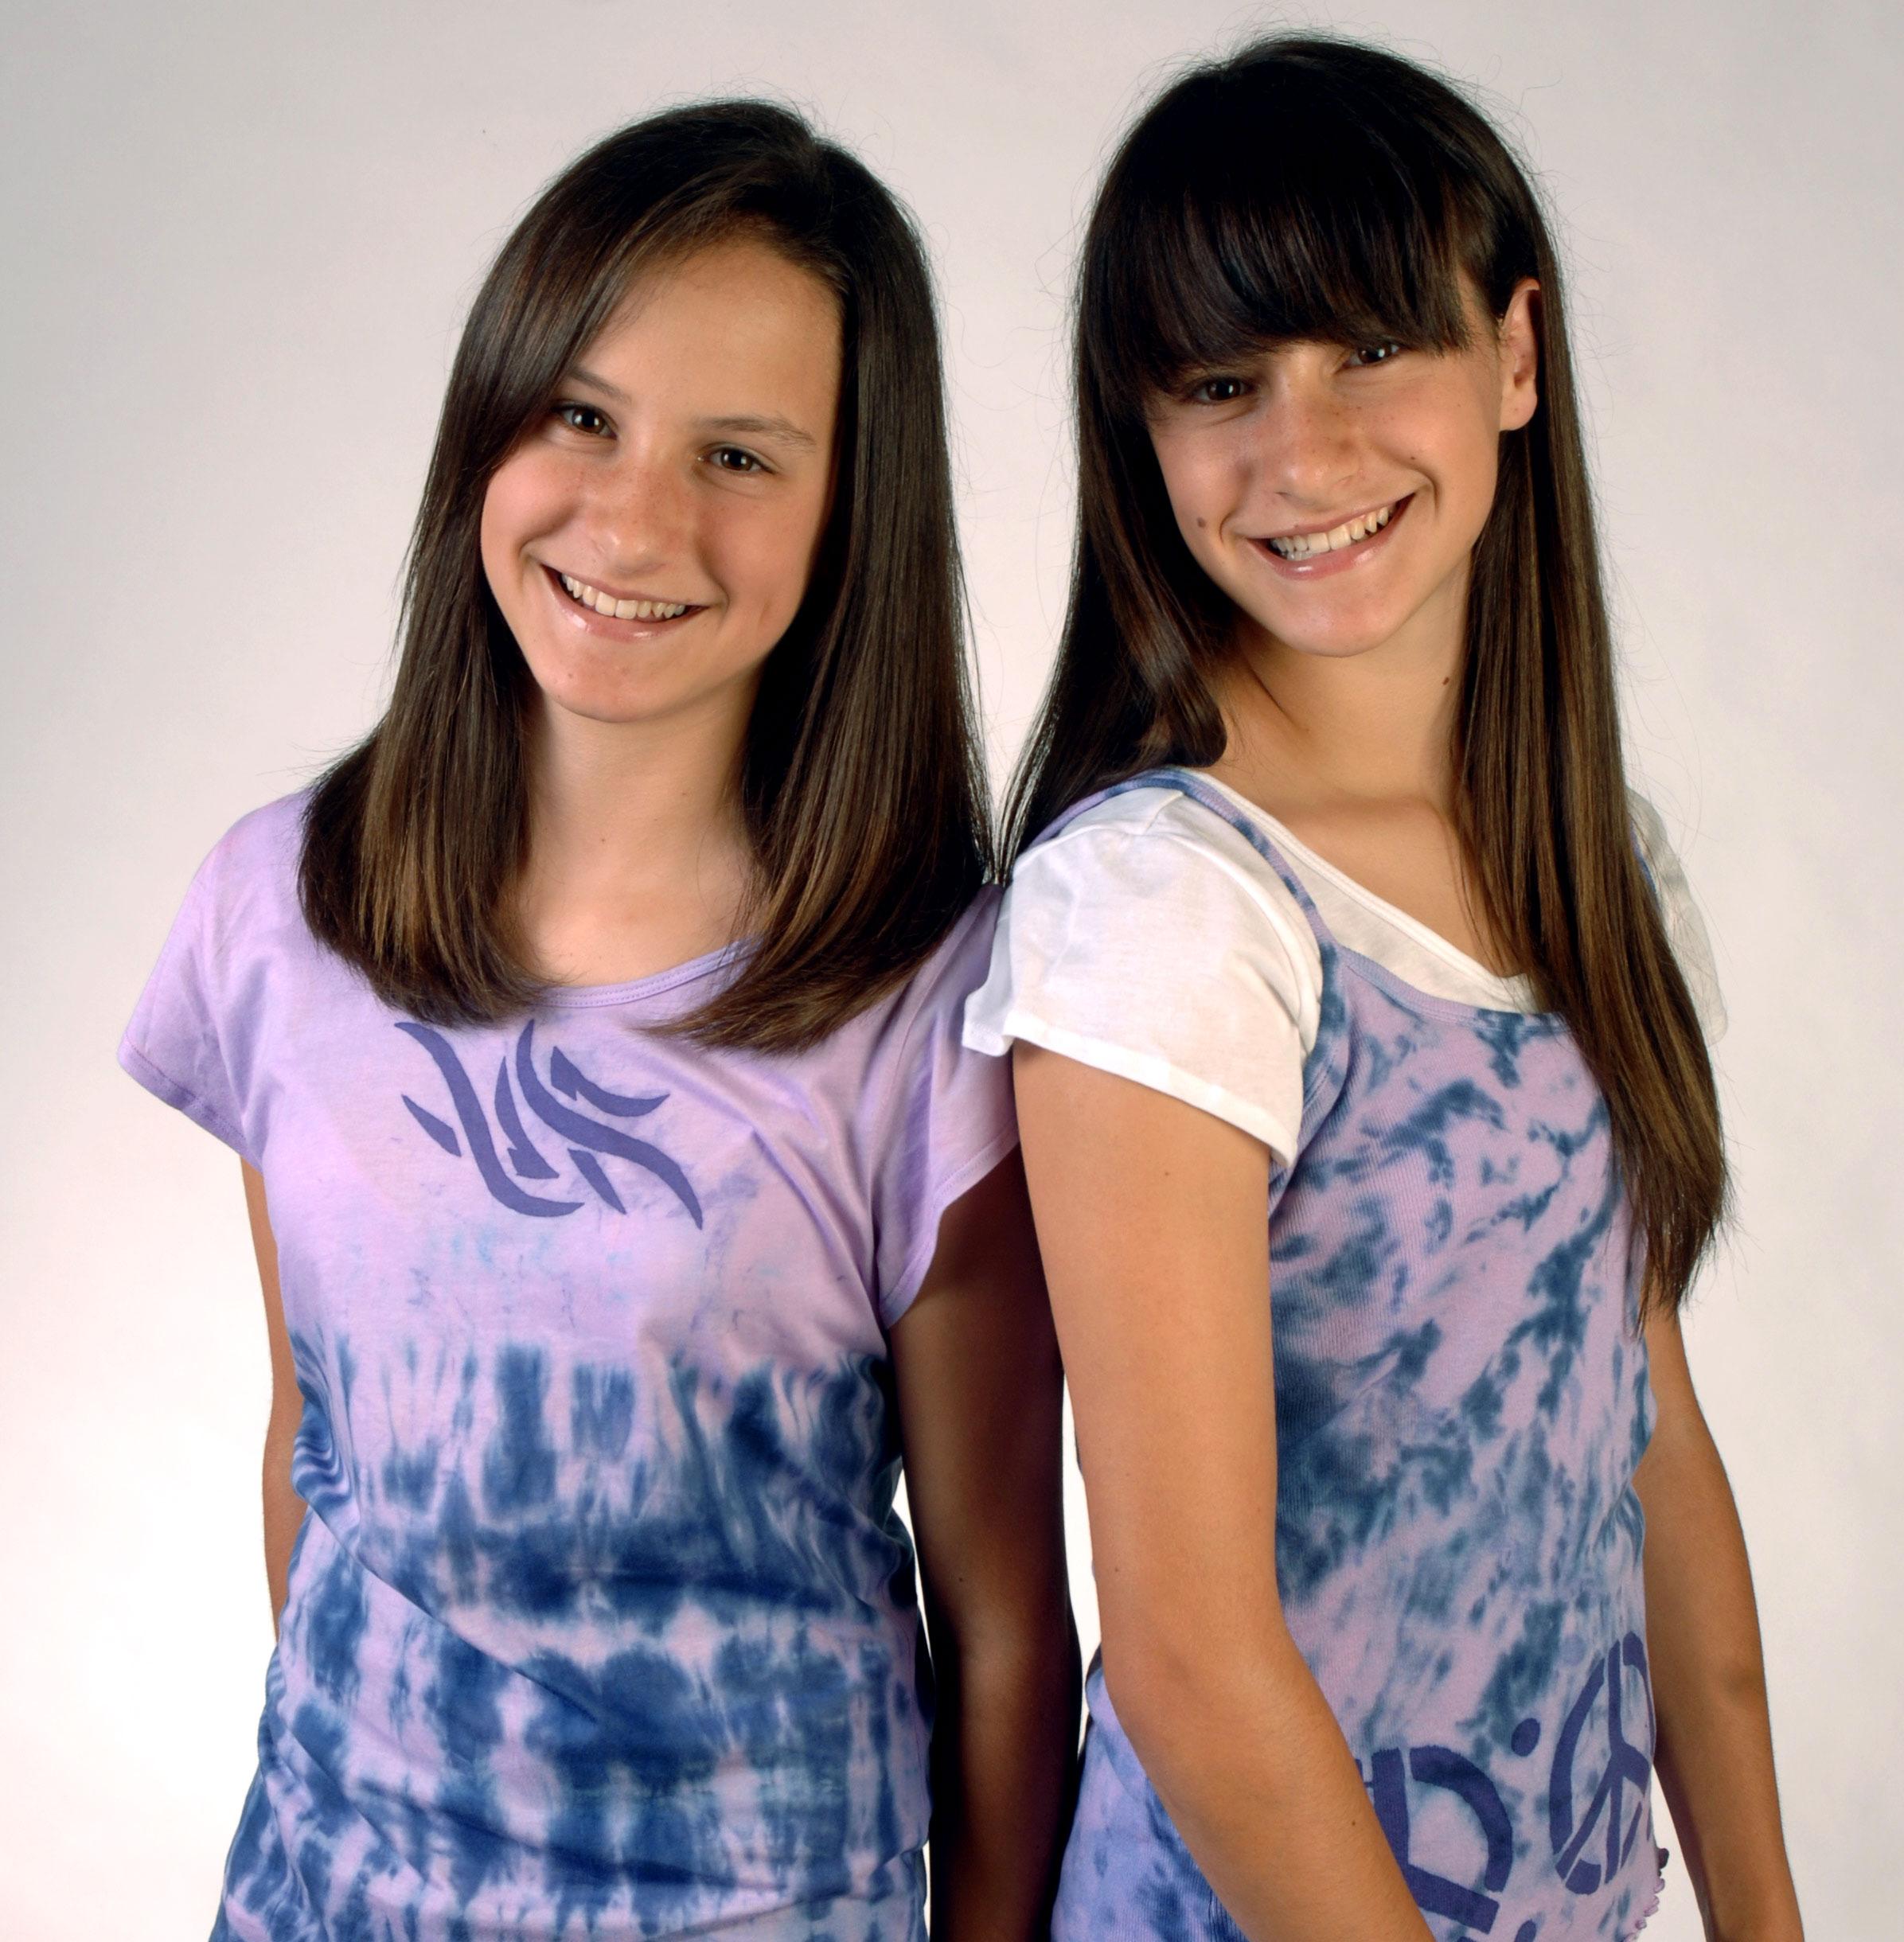 color-magent-2-girls-purple.jpg